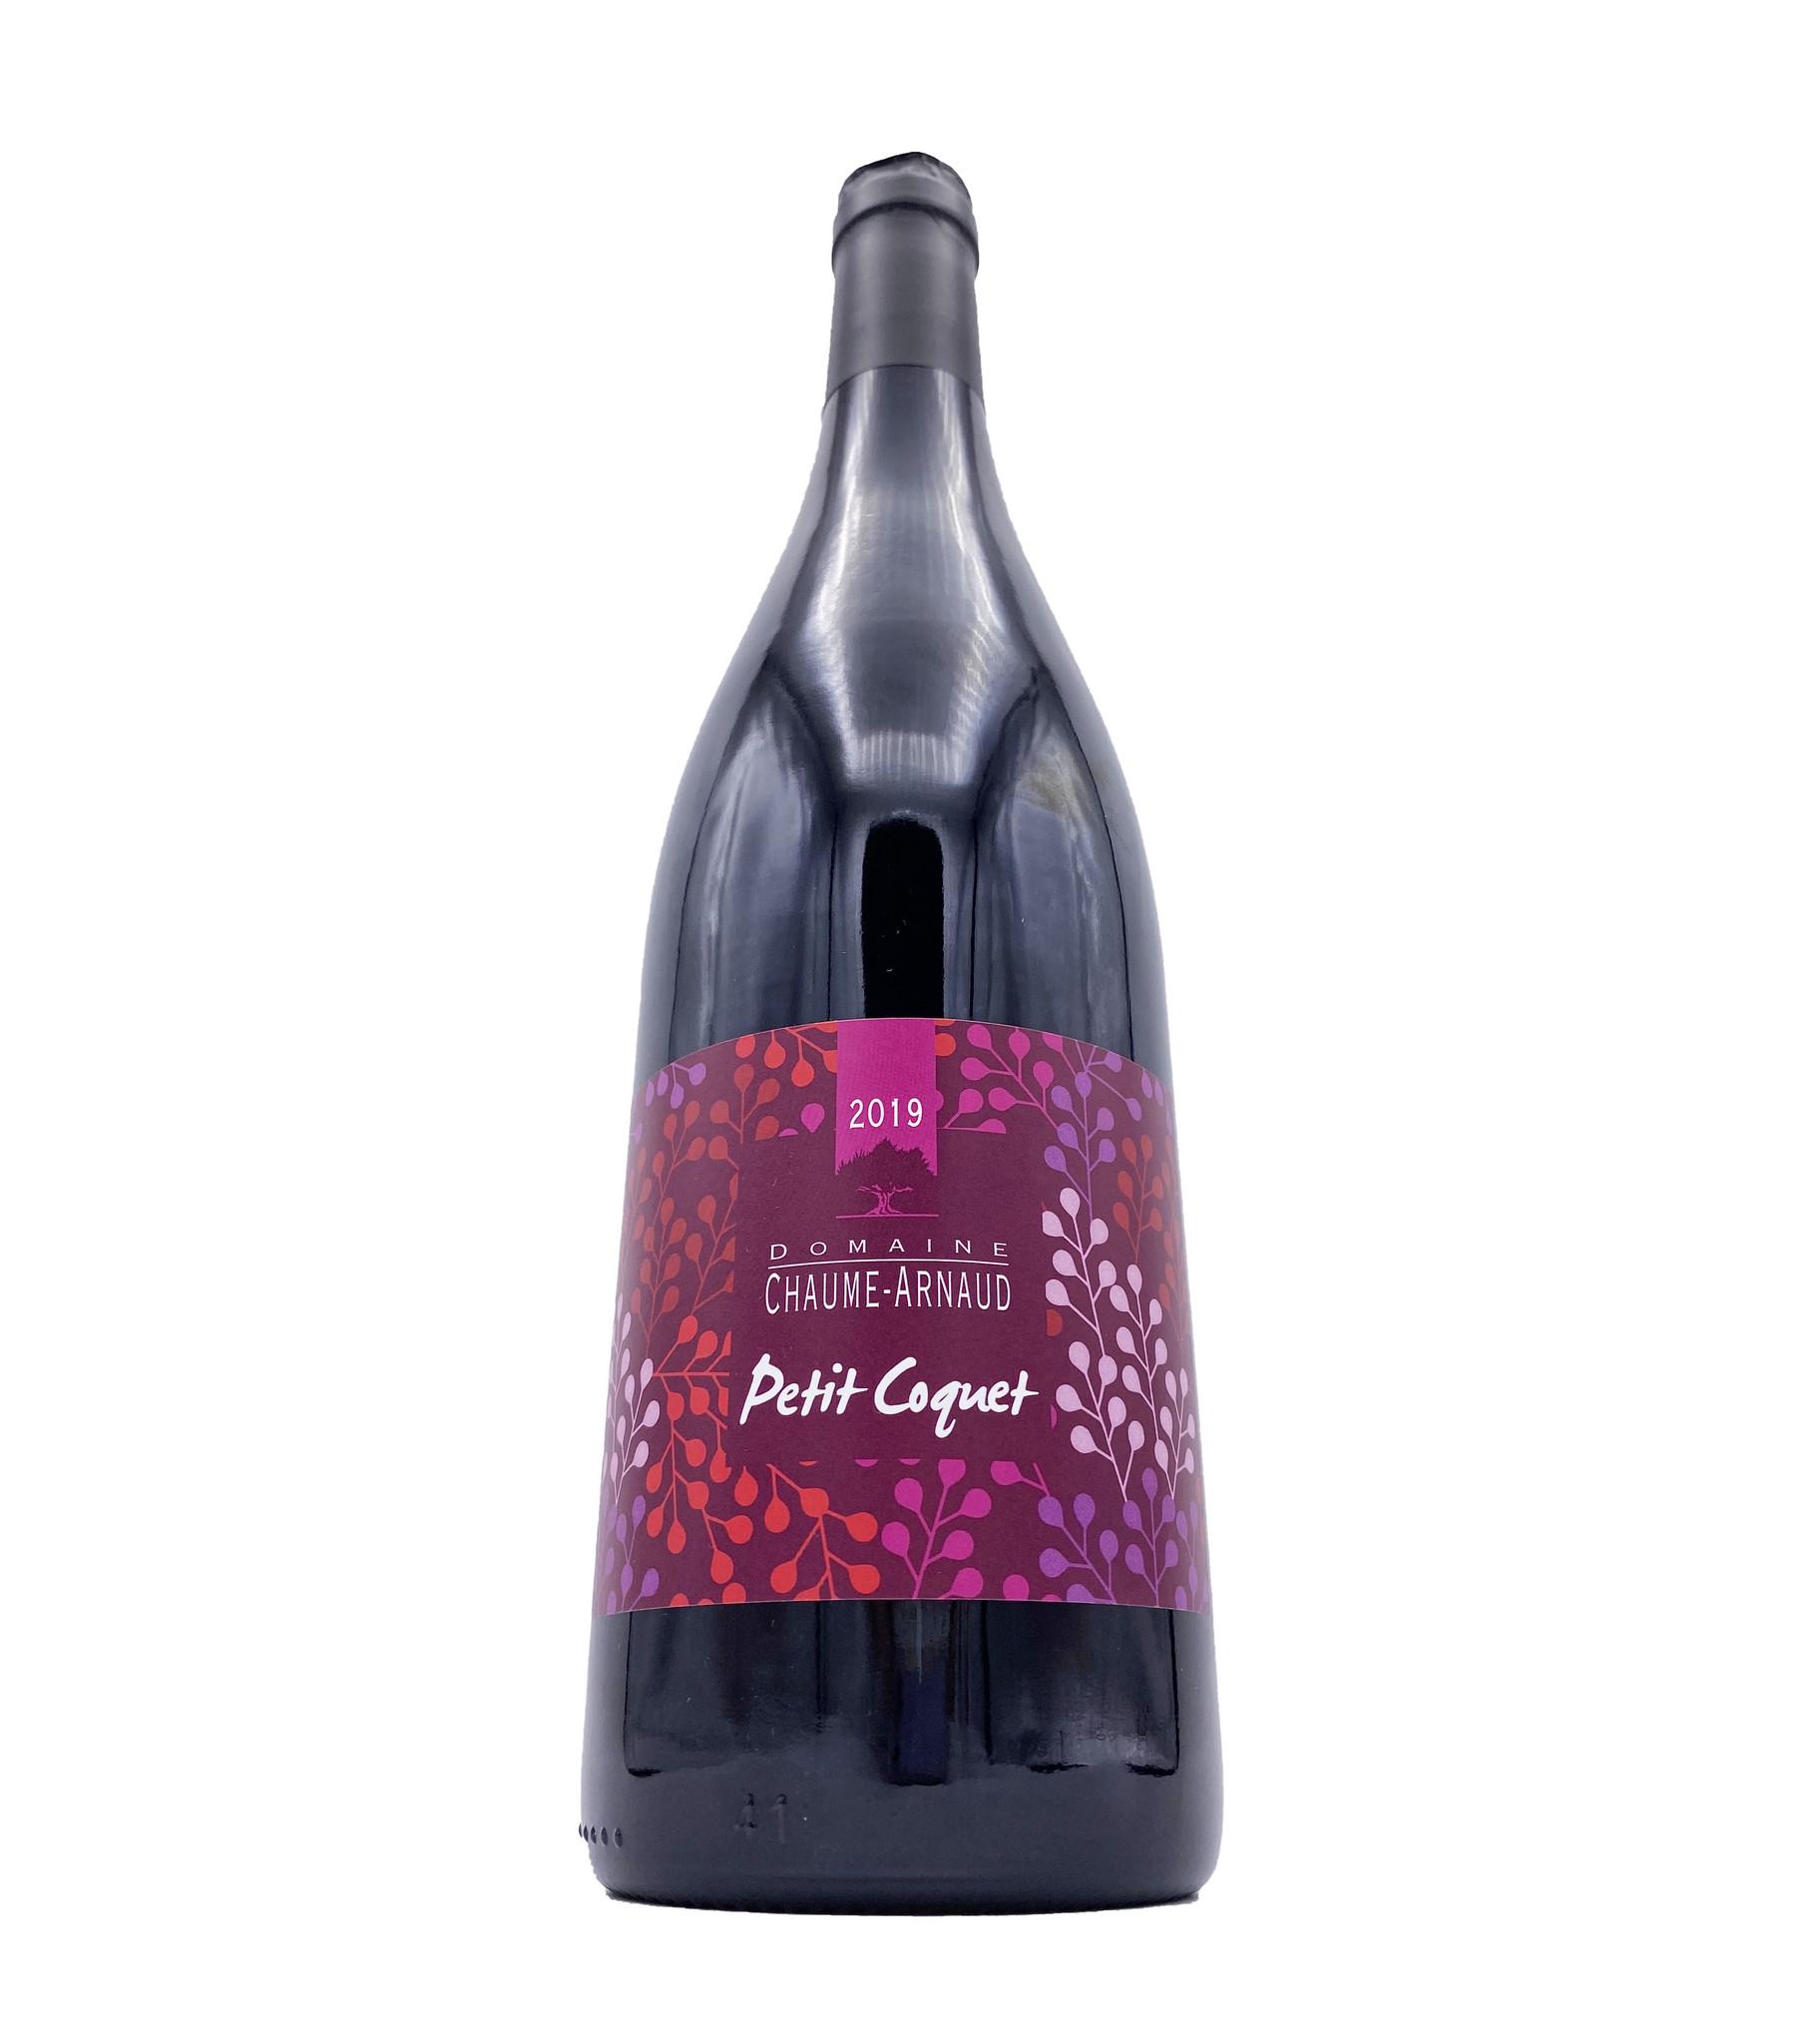 Côtes du Rhône Petit Coquet 2019 Chaume-Arnaud